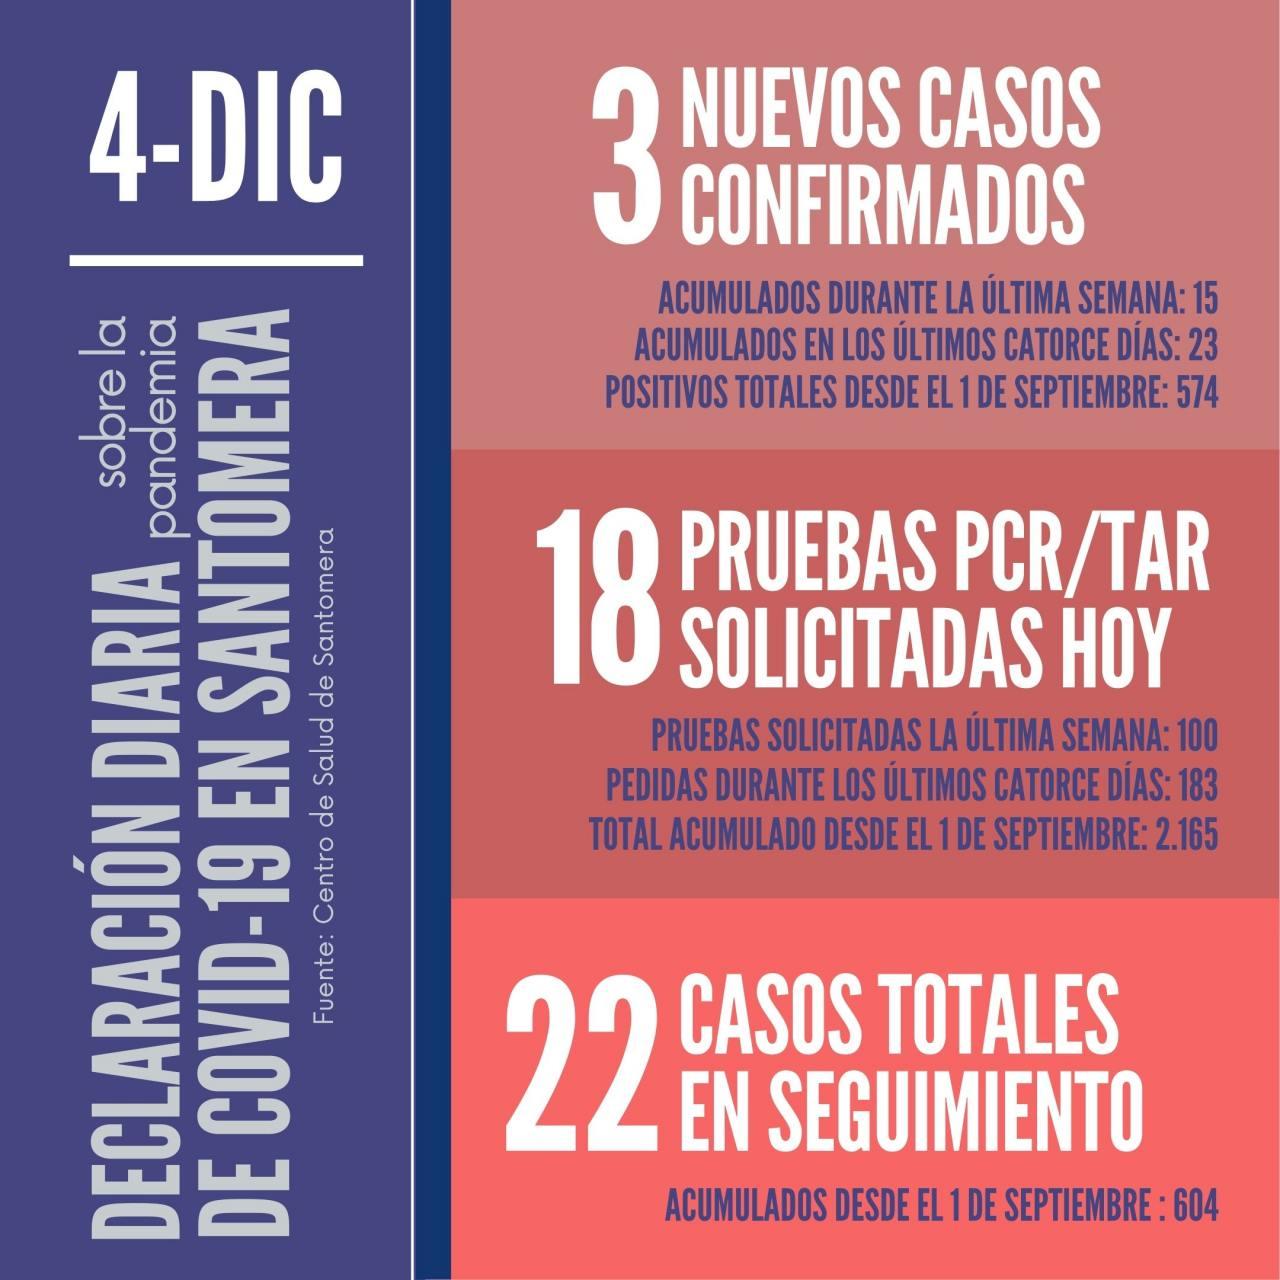 20201204_Datos-COVID-19-Santomera